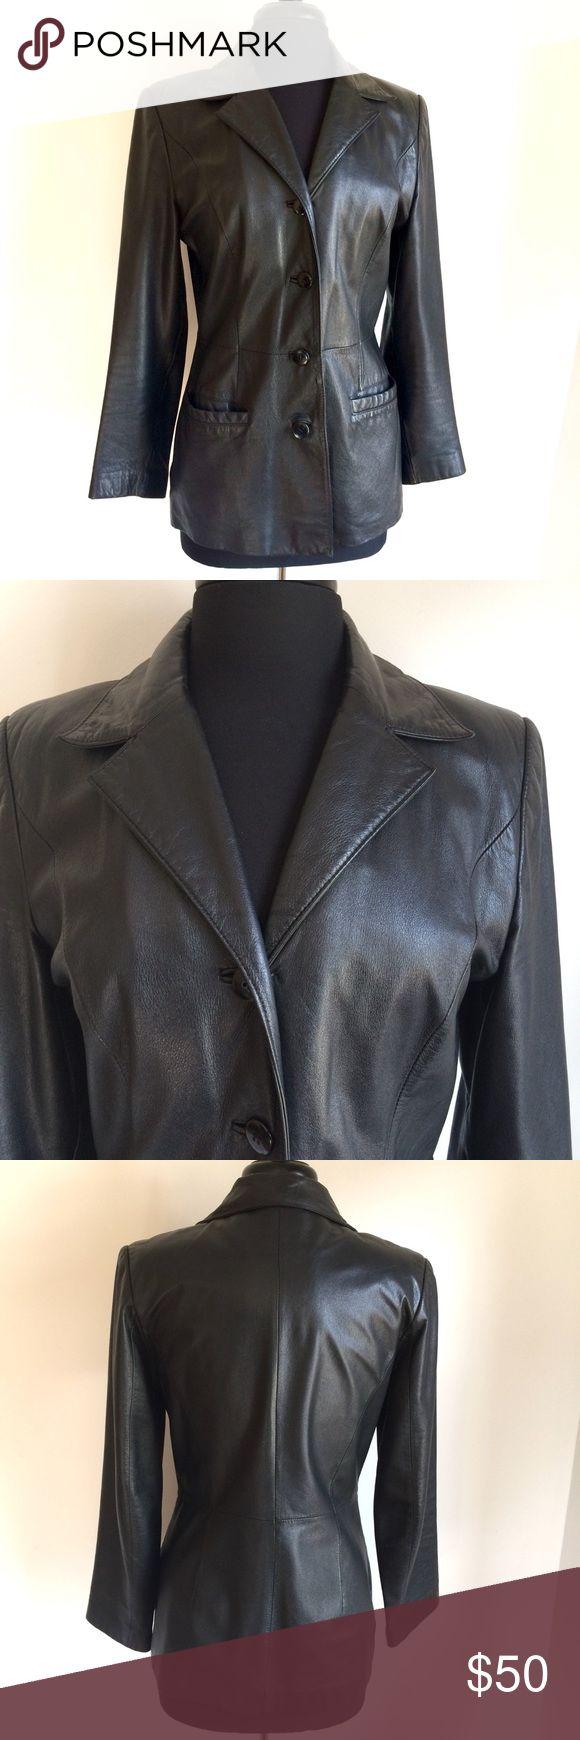 I just added this listing on Poshmark: Danier leather jacket S 6-8 blazer black 4 button. #shopmycloset #poshmark #fashion #shopping #style #forsale #danier canada #Jackets & Blazers